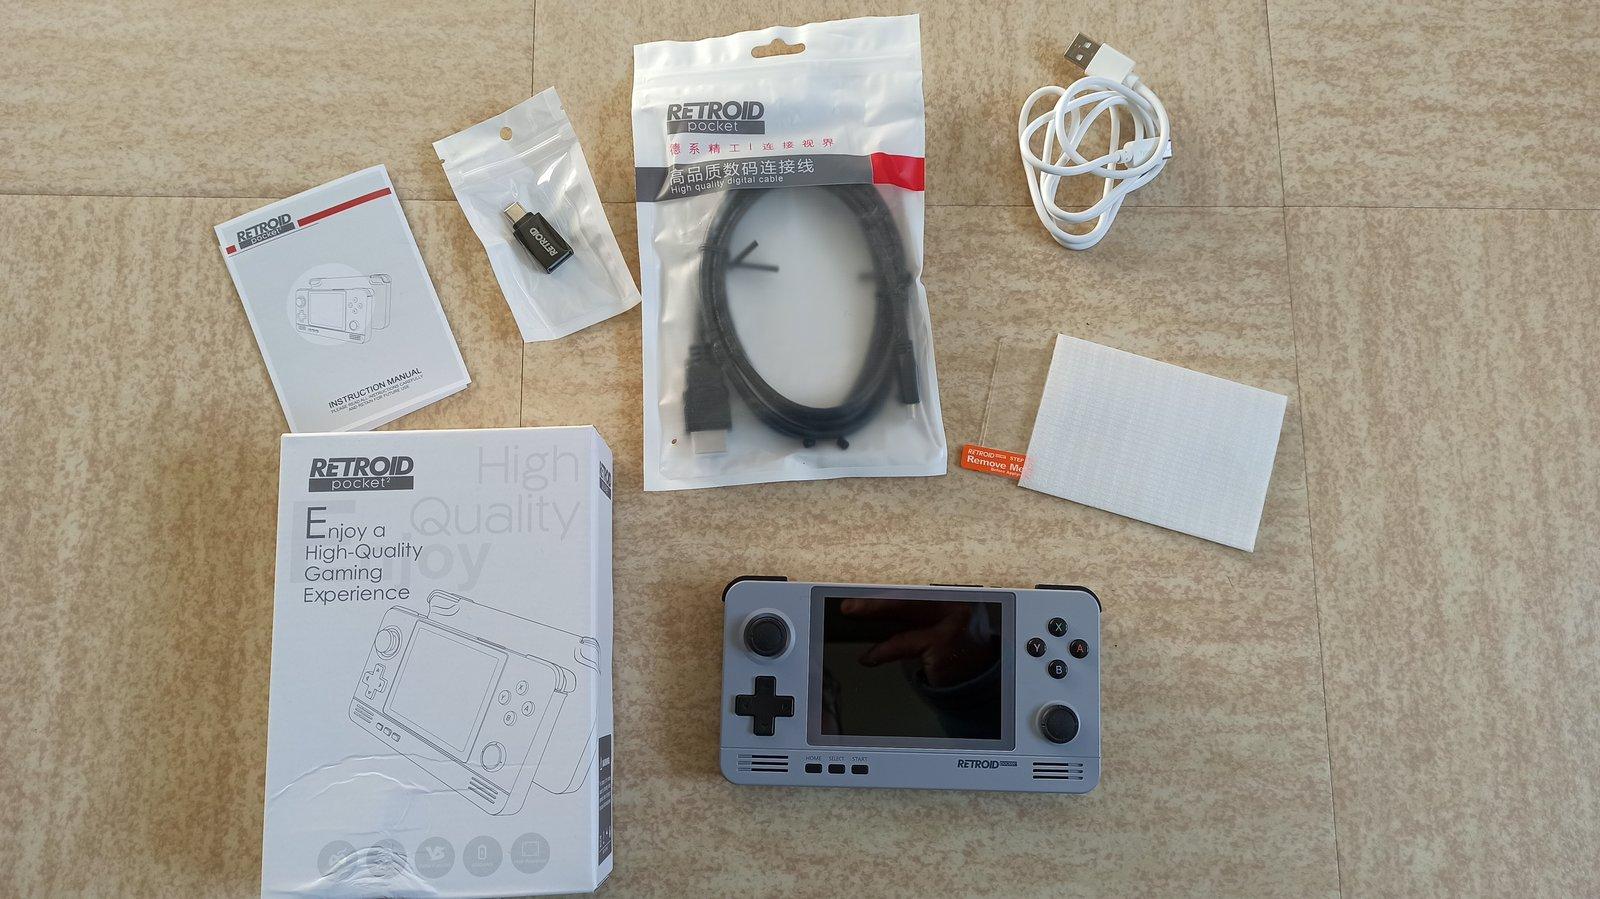 RG350 mod Sakura / Retroid Pocket 2  210110052556309261